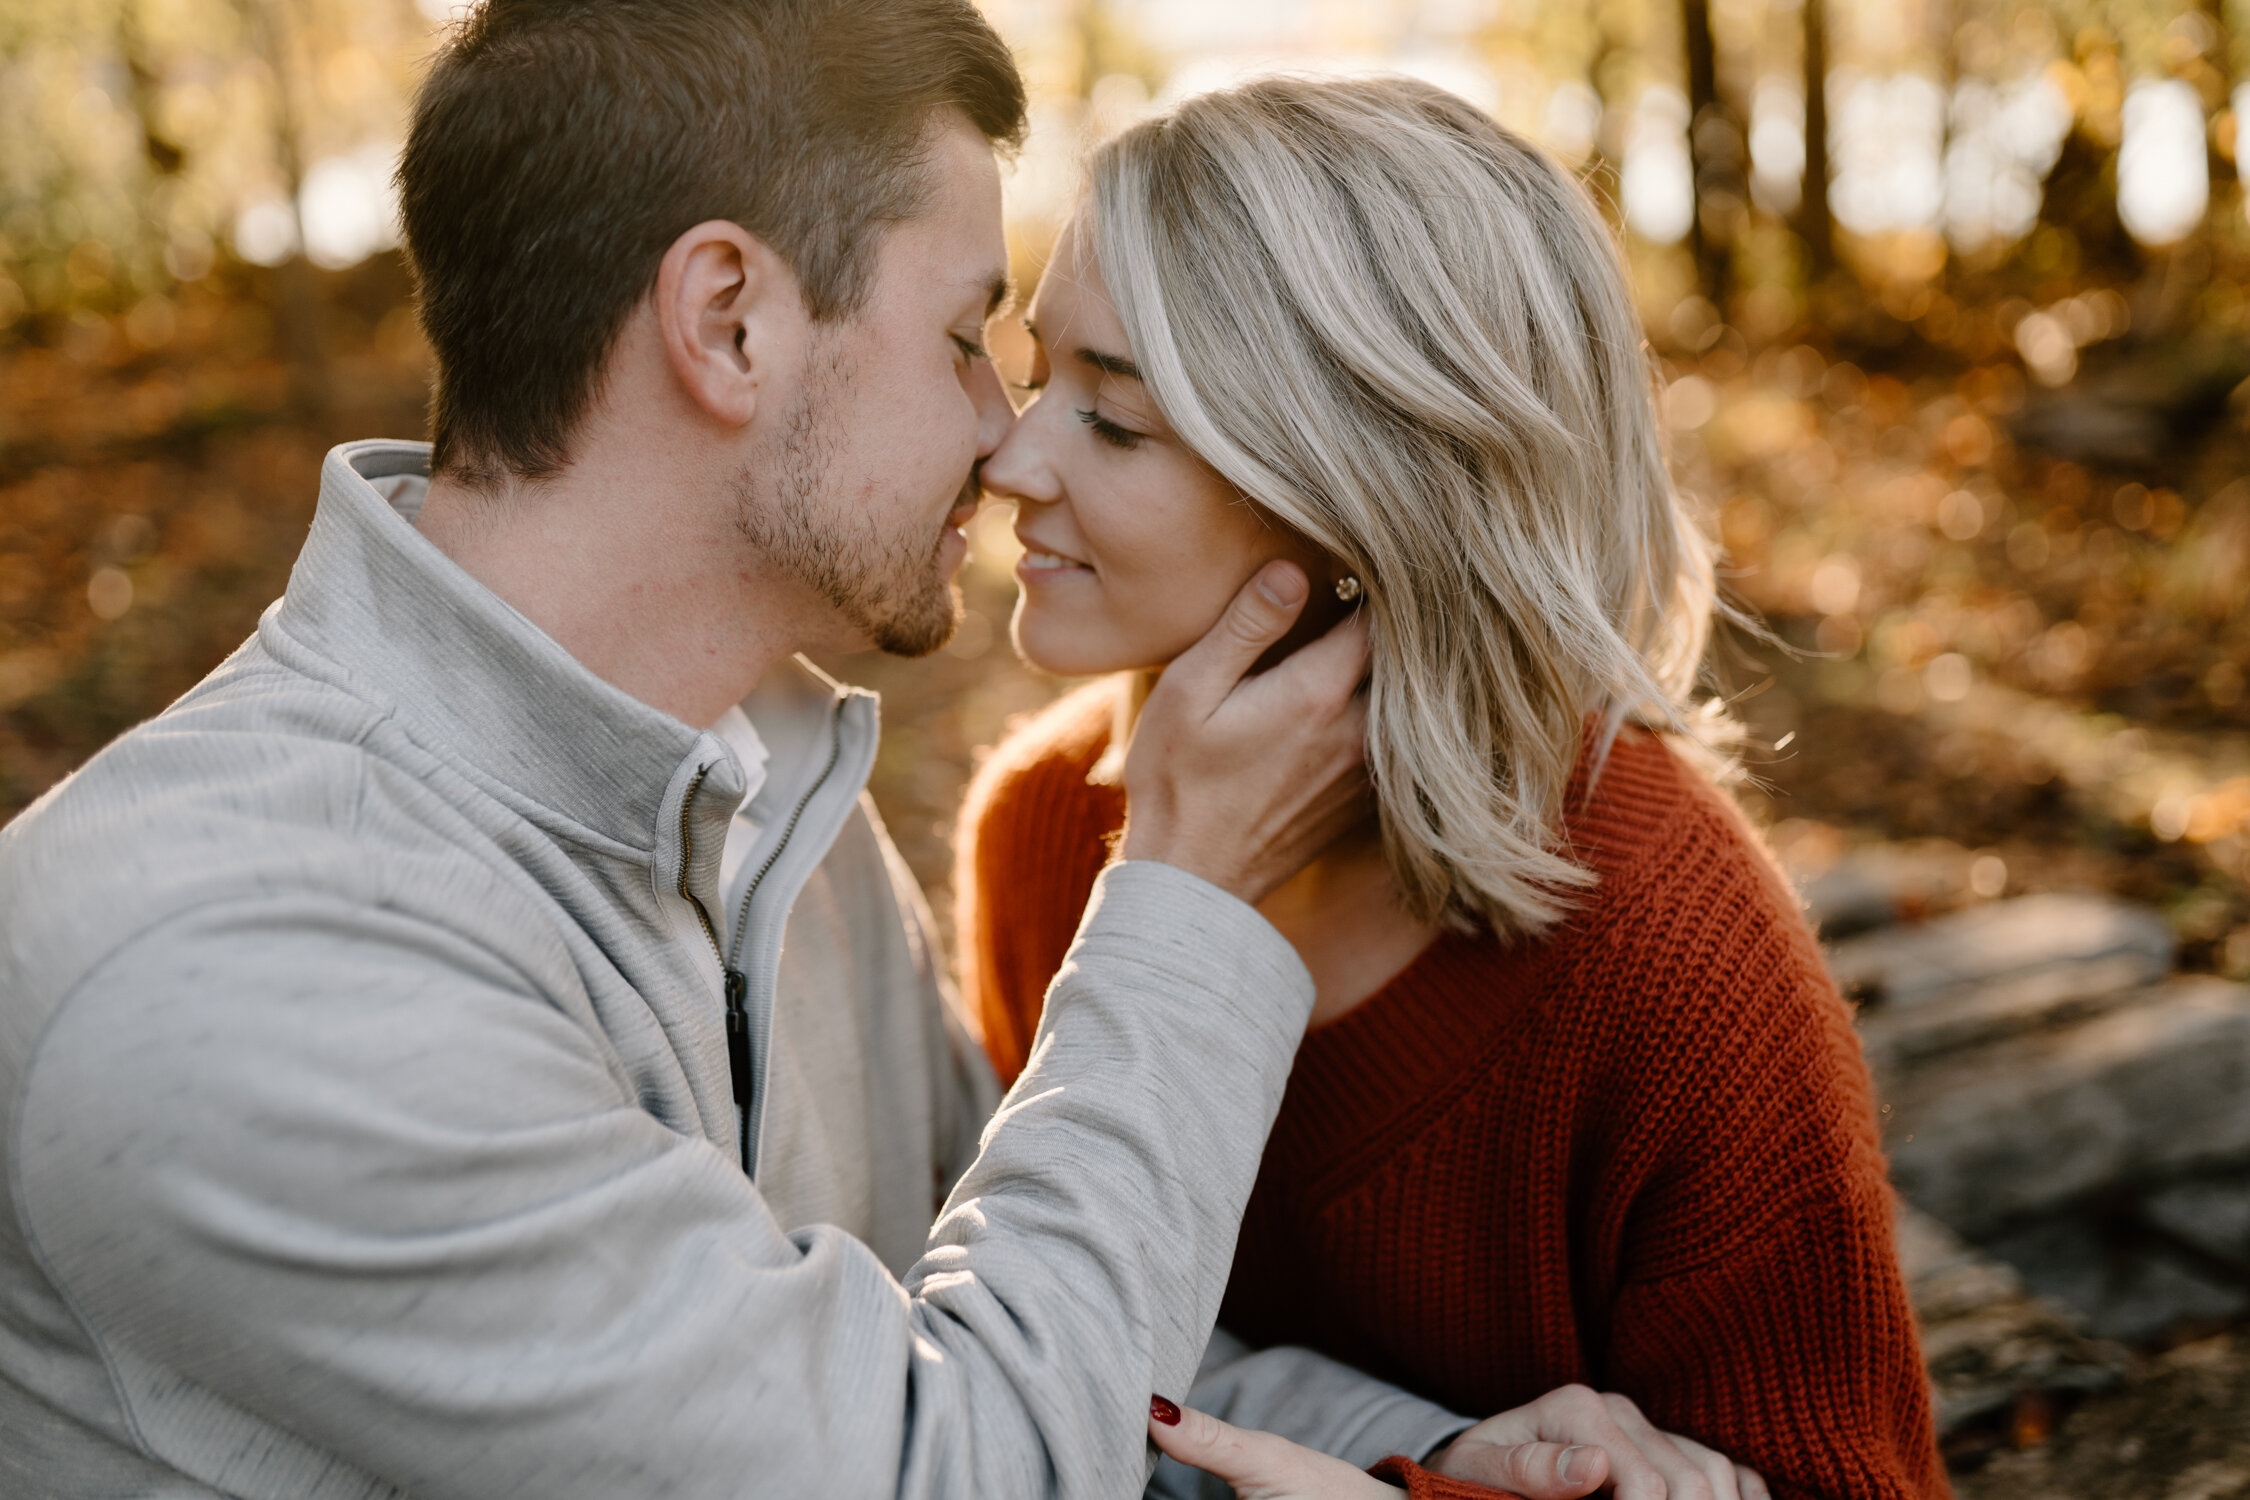 Romantic golden hour engagement photos in Greensboro, NC